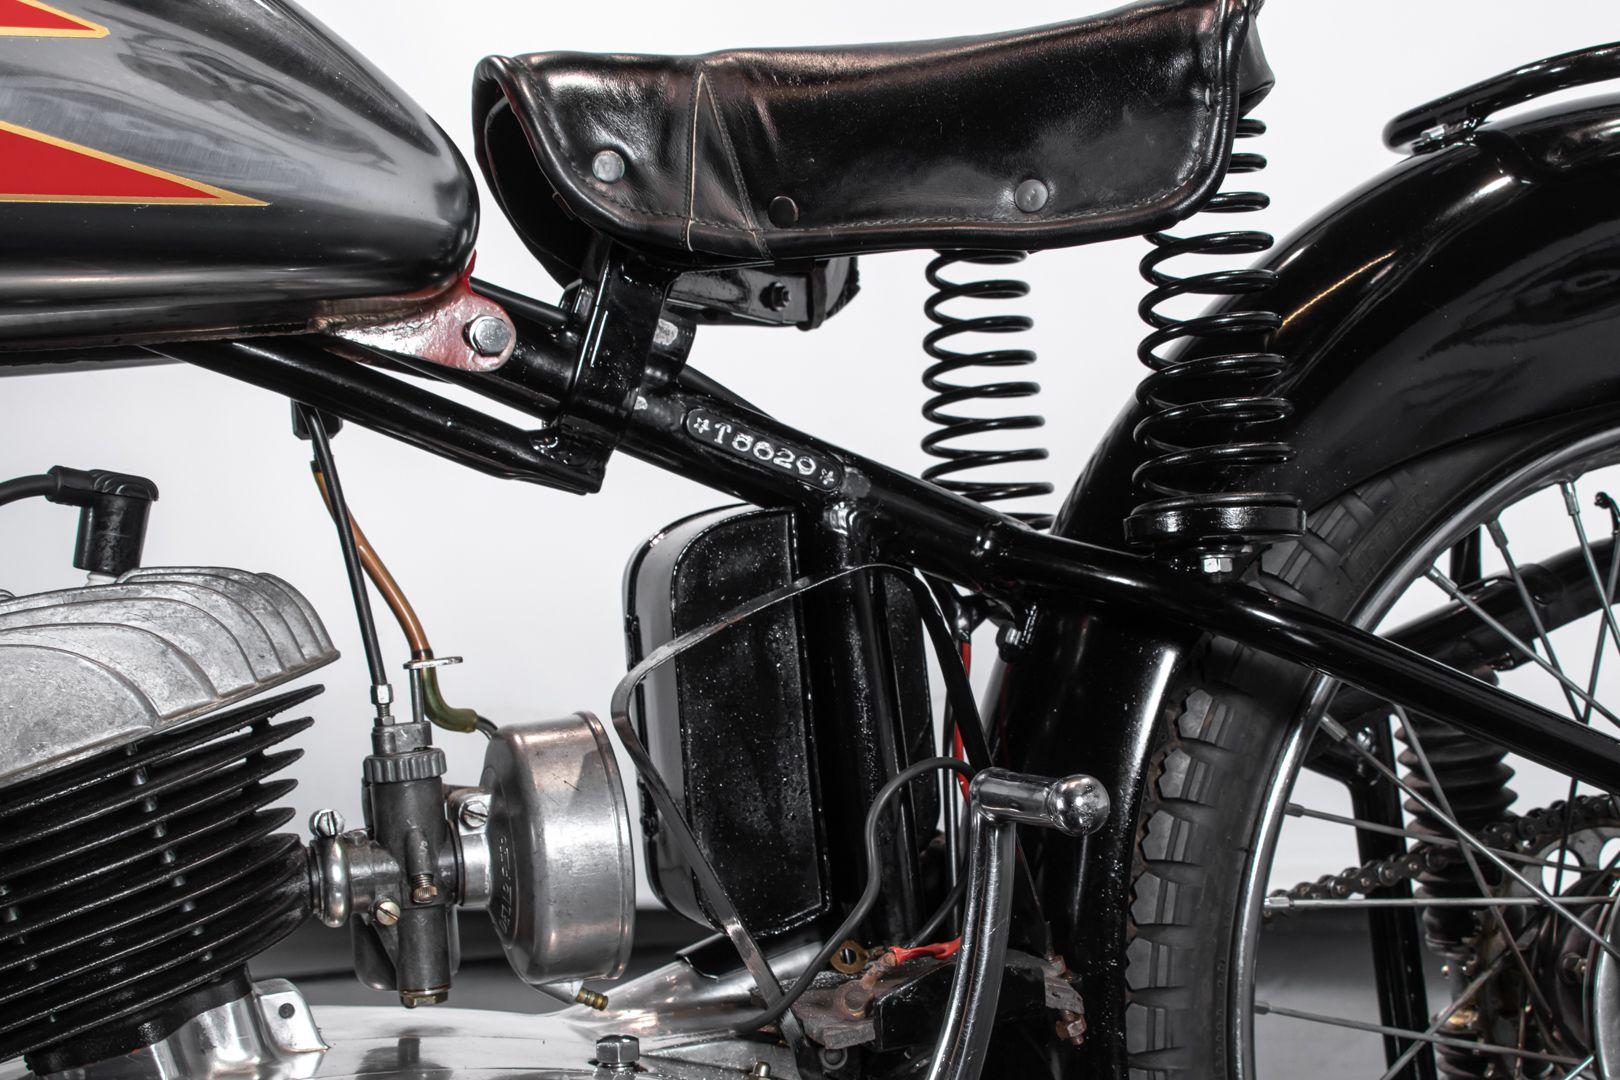 1952 Moto Morini Motore Lungo 2T 125 78784